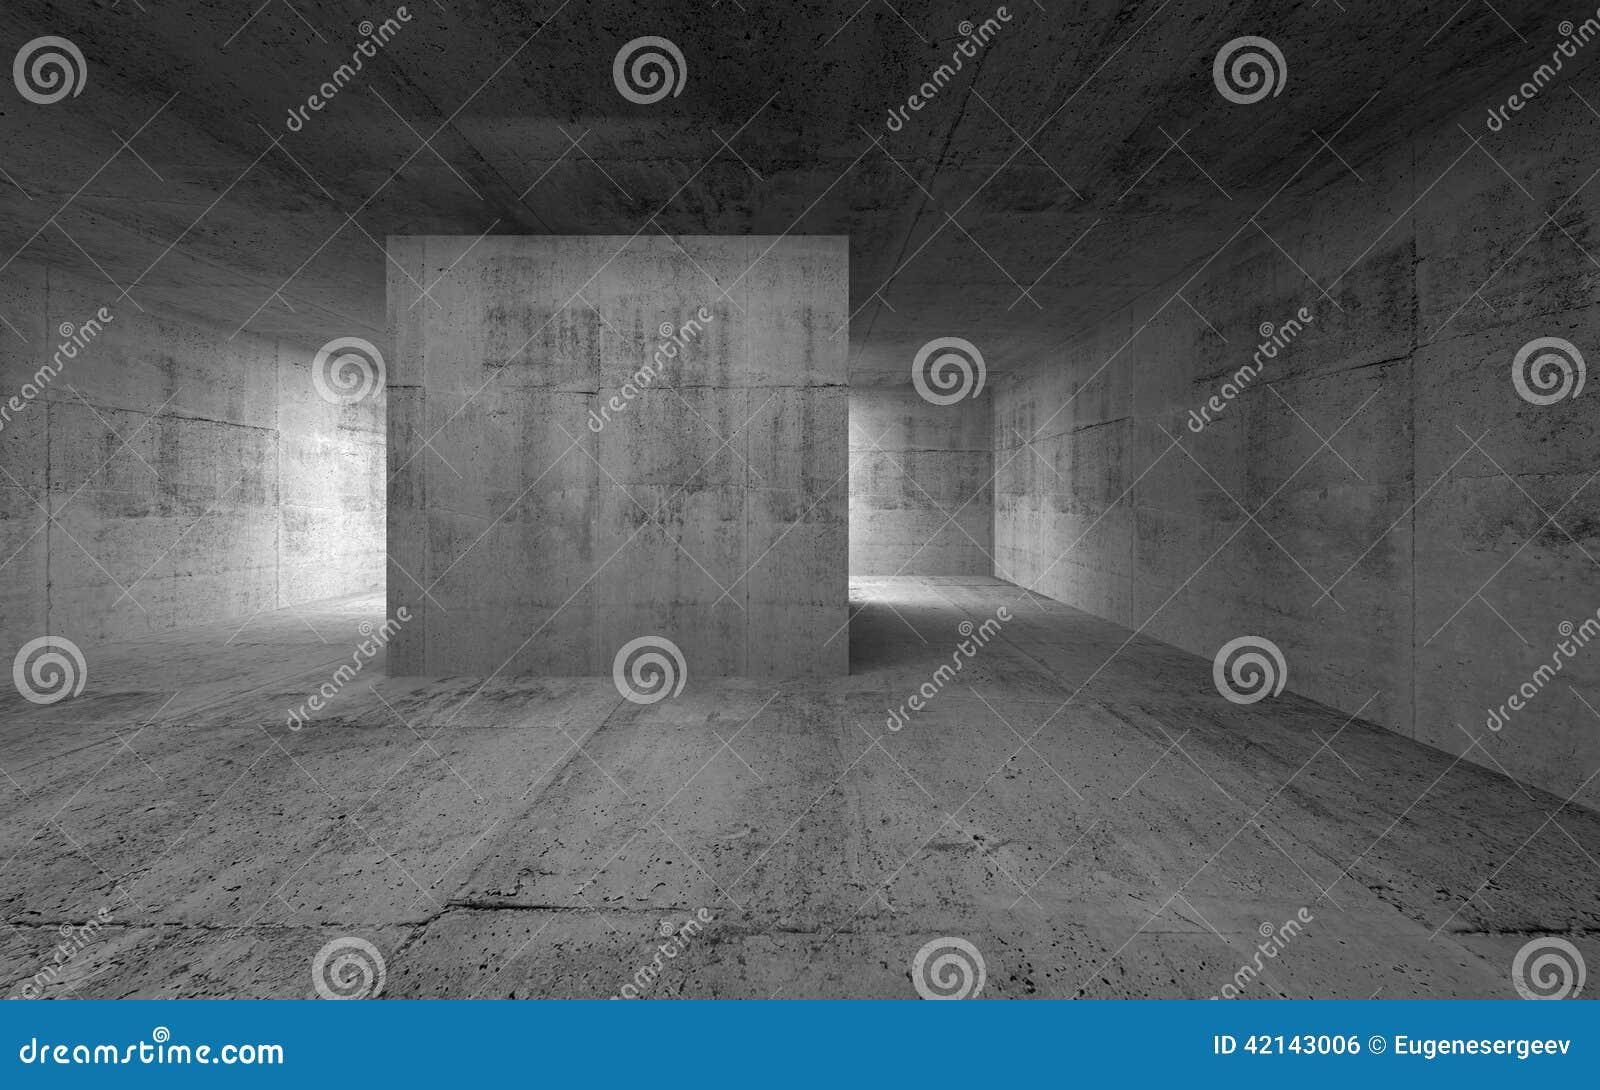 Dark empty room with window - Empty Room Dark Abstract Concrete Interior Royalty Free Stock Image